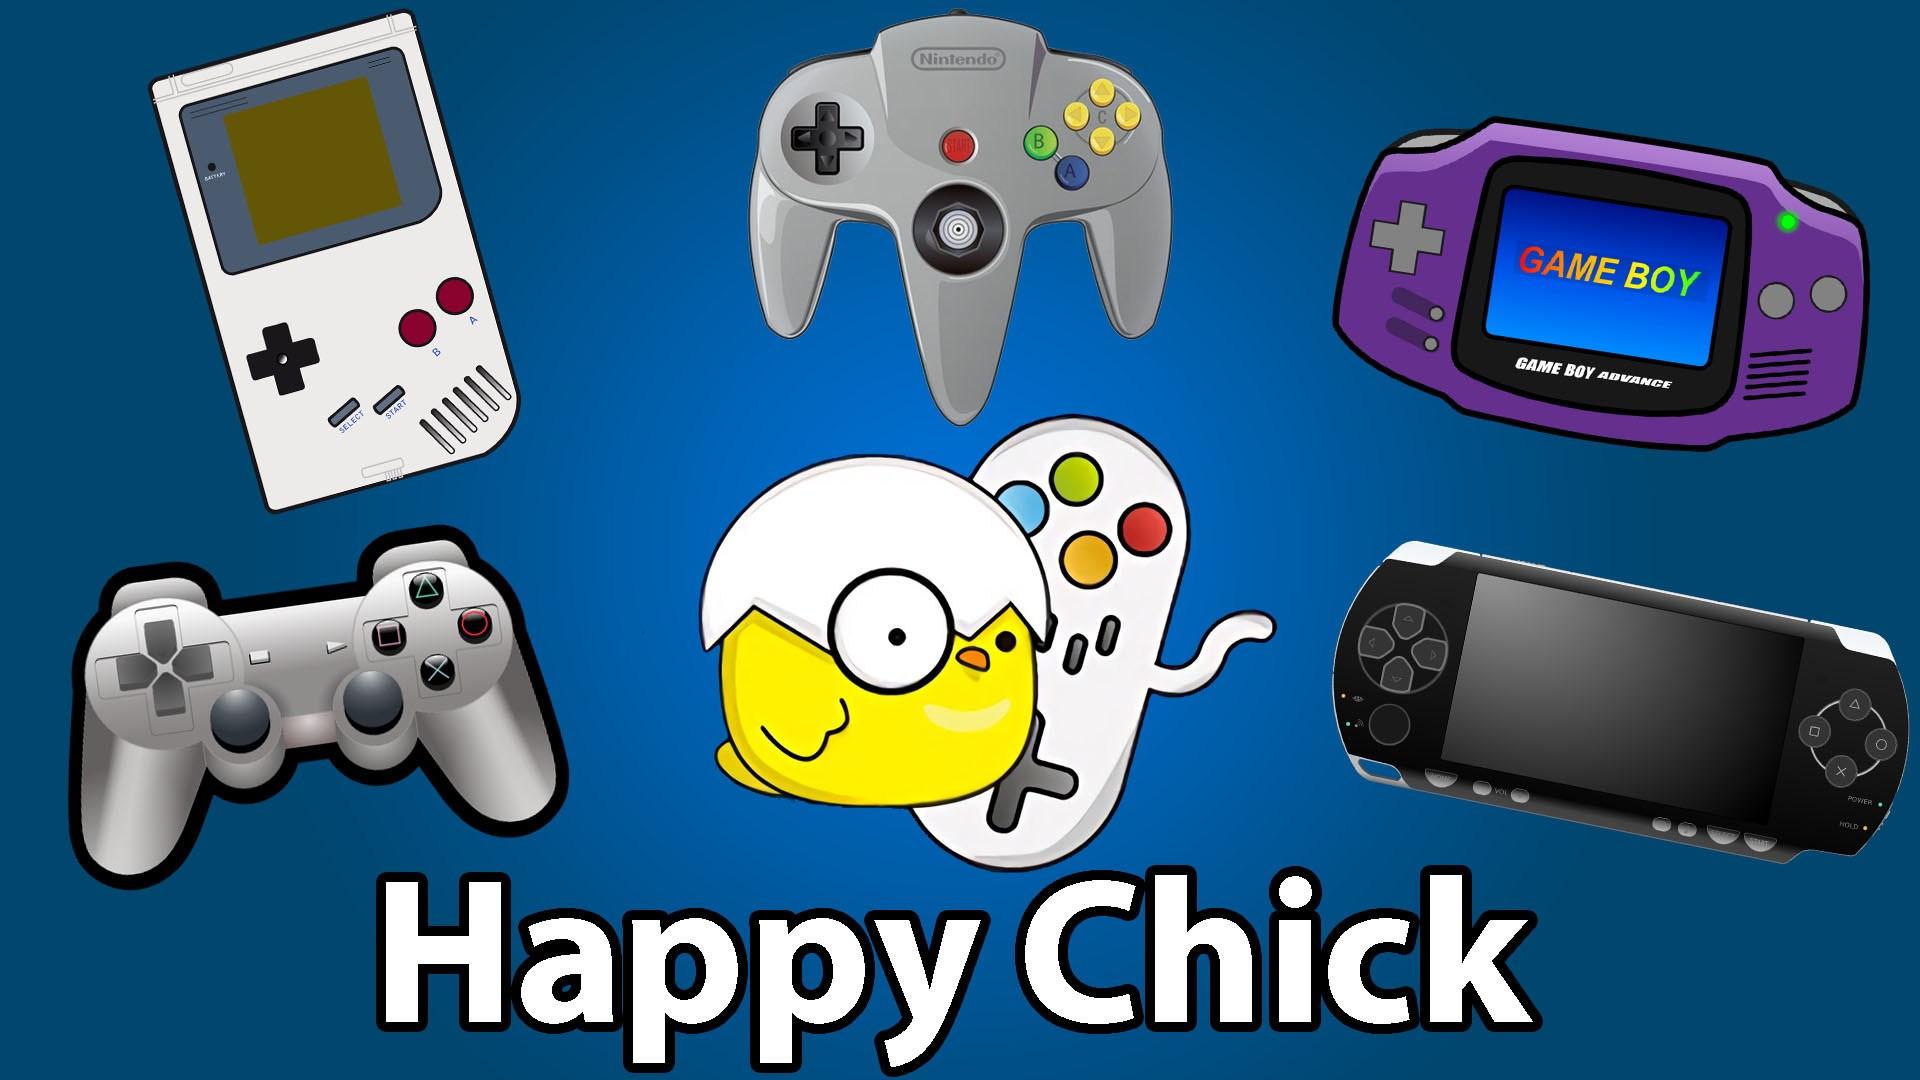 Happy Chick